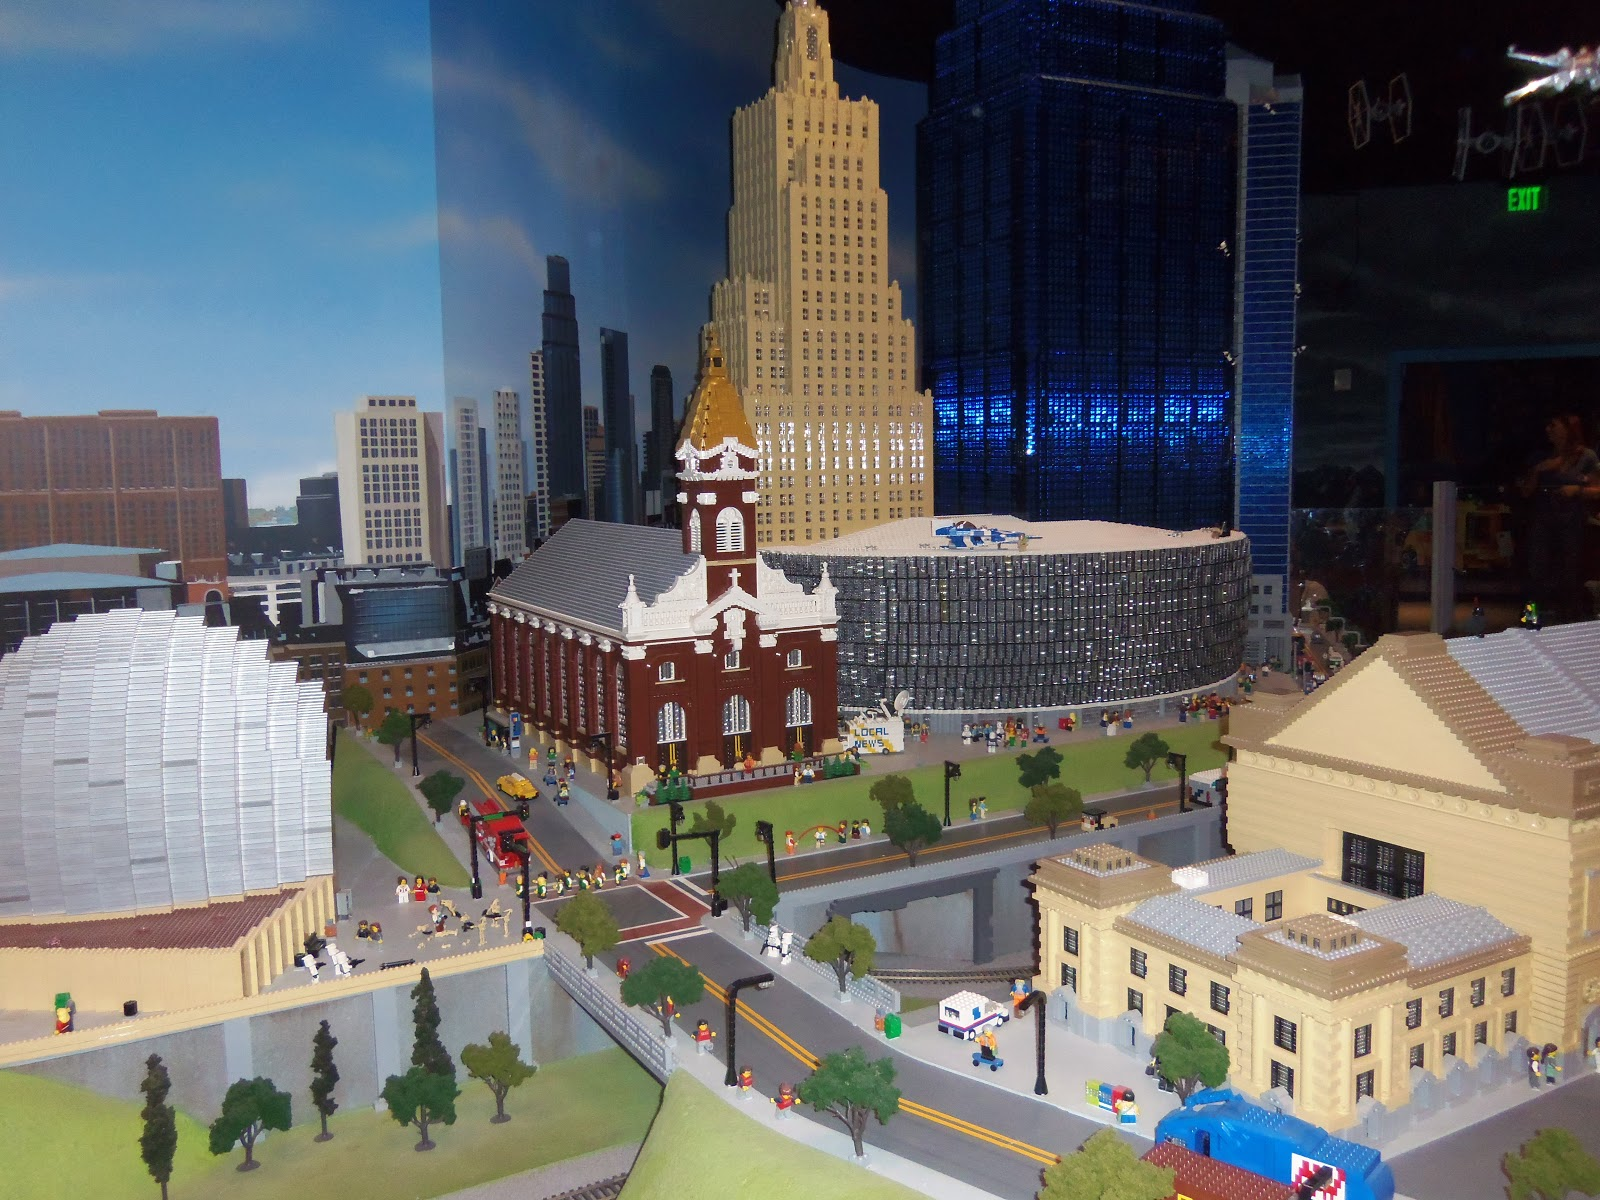 Kostiuk Crew: LegoLand in Kansas City (Picture Overload)